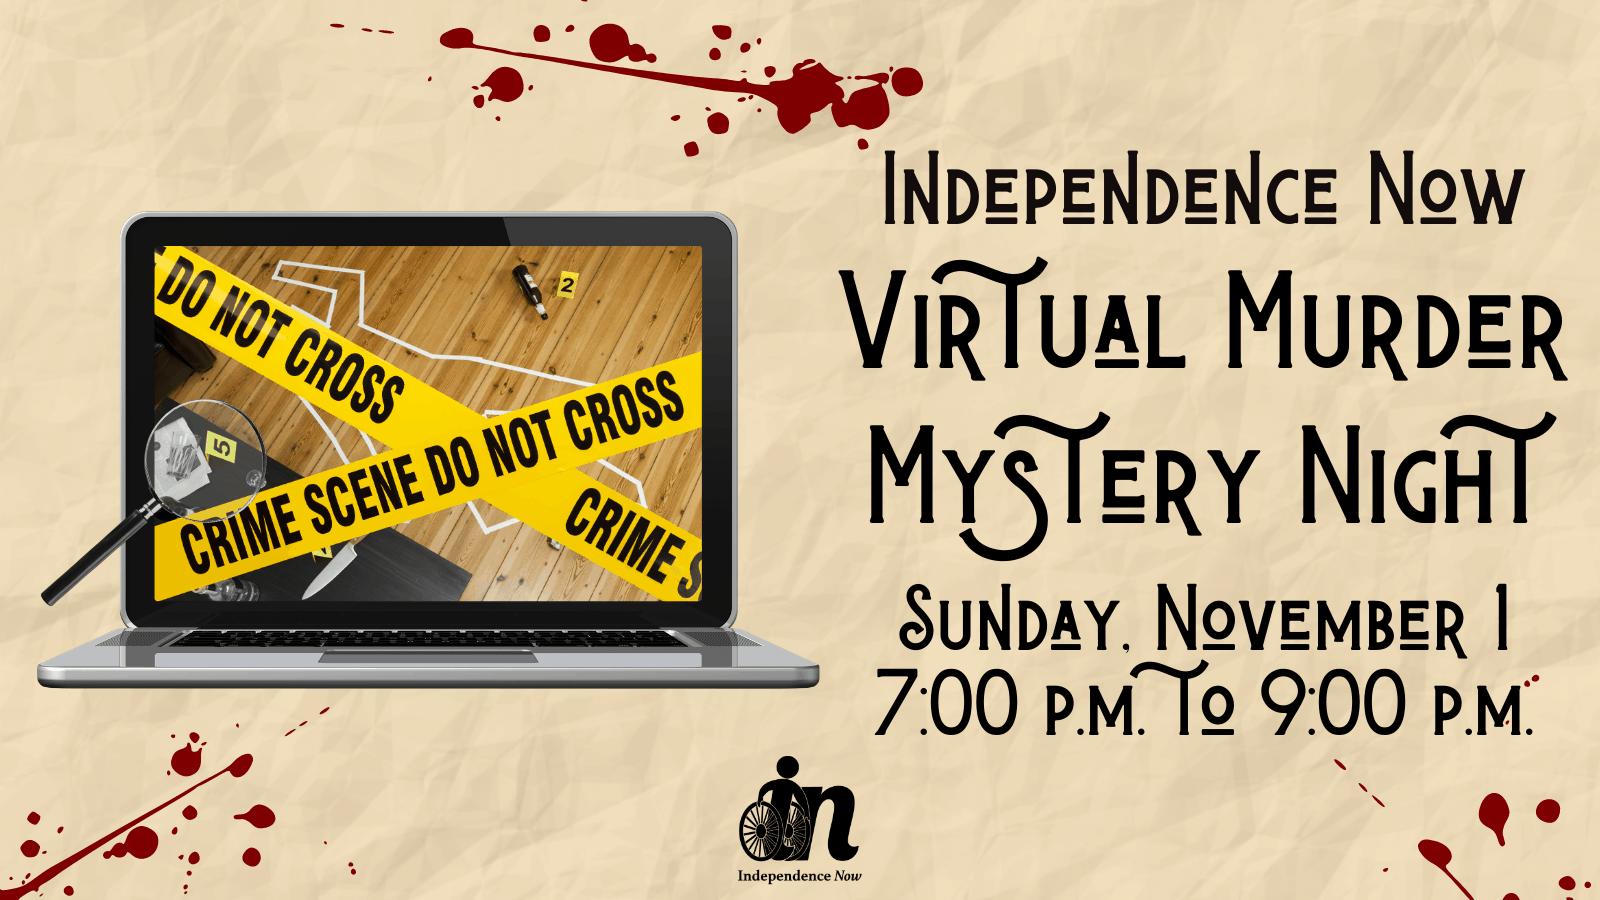 Virtual Murder Mystery Night